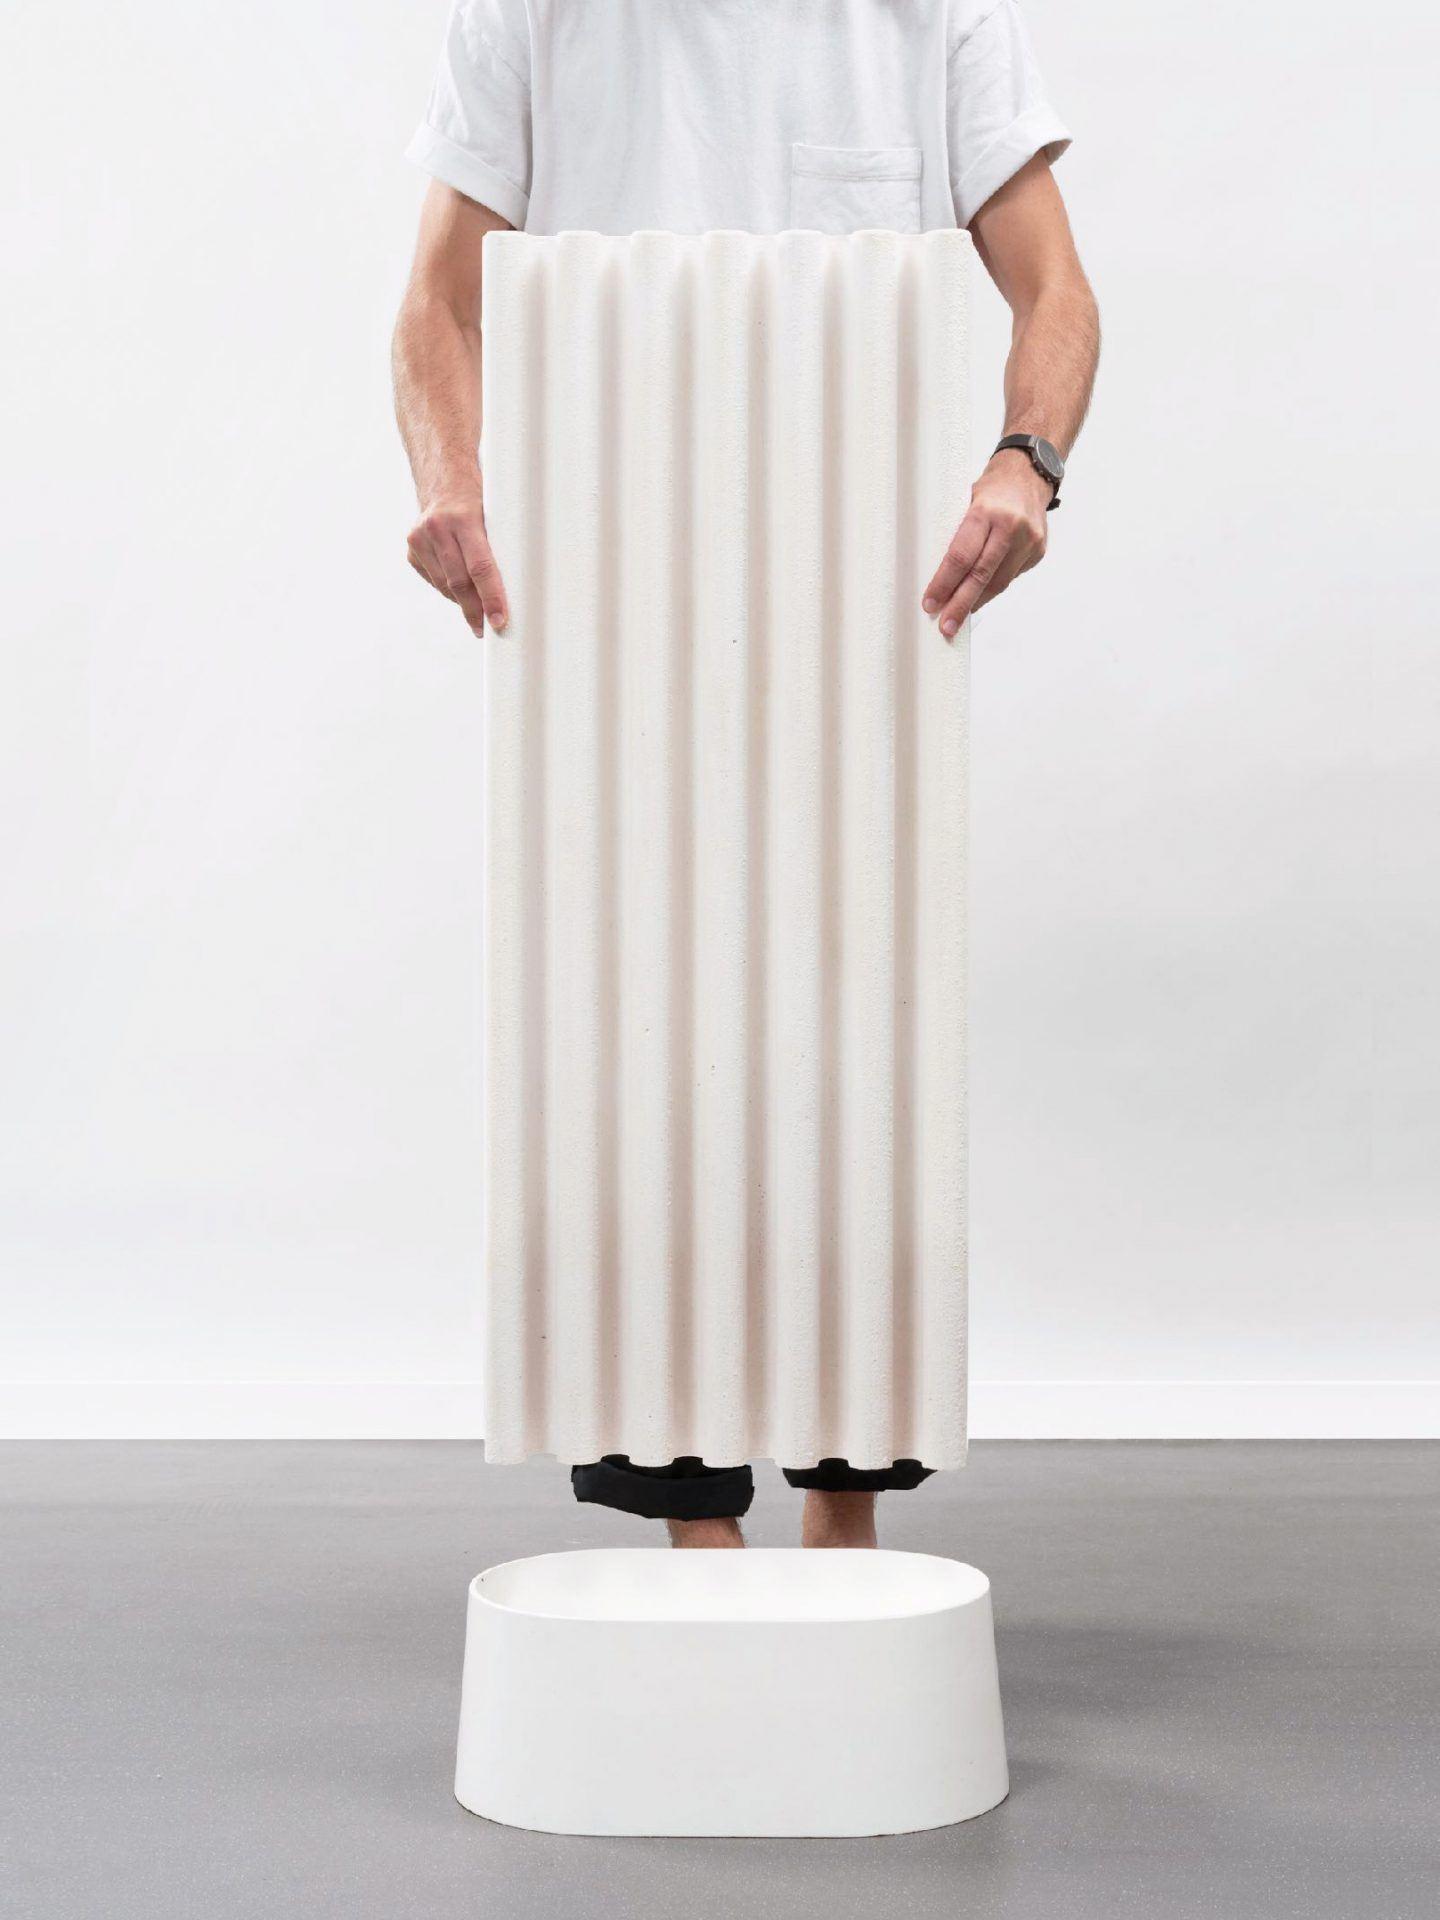 IGNANT-Design-LouisCourcier-1